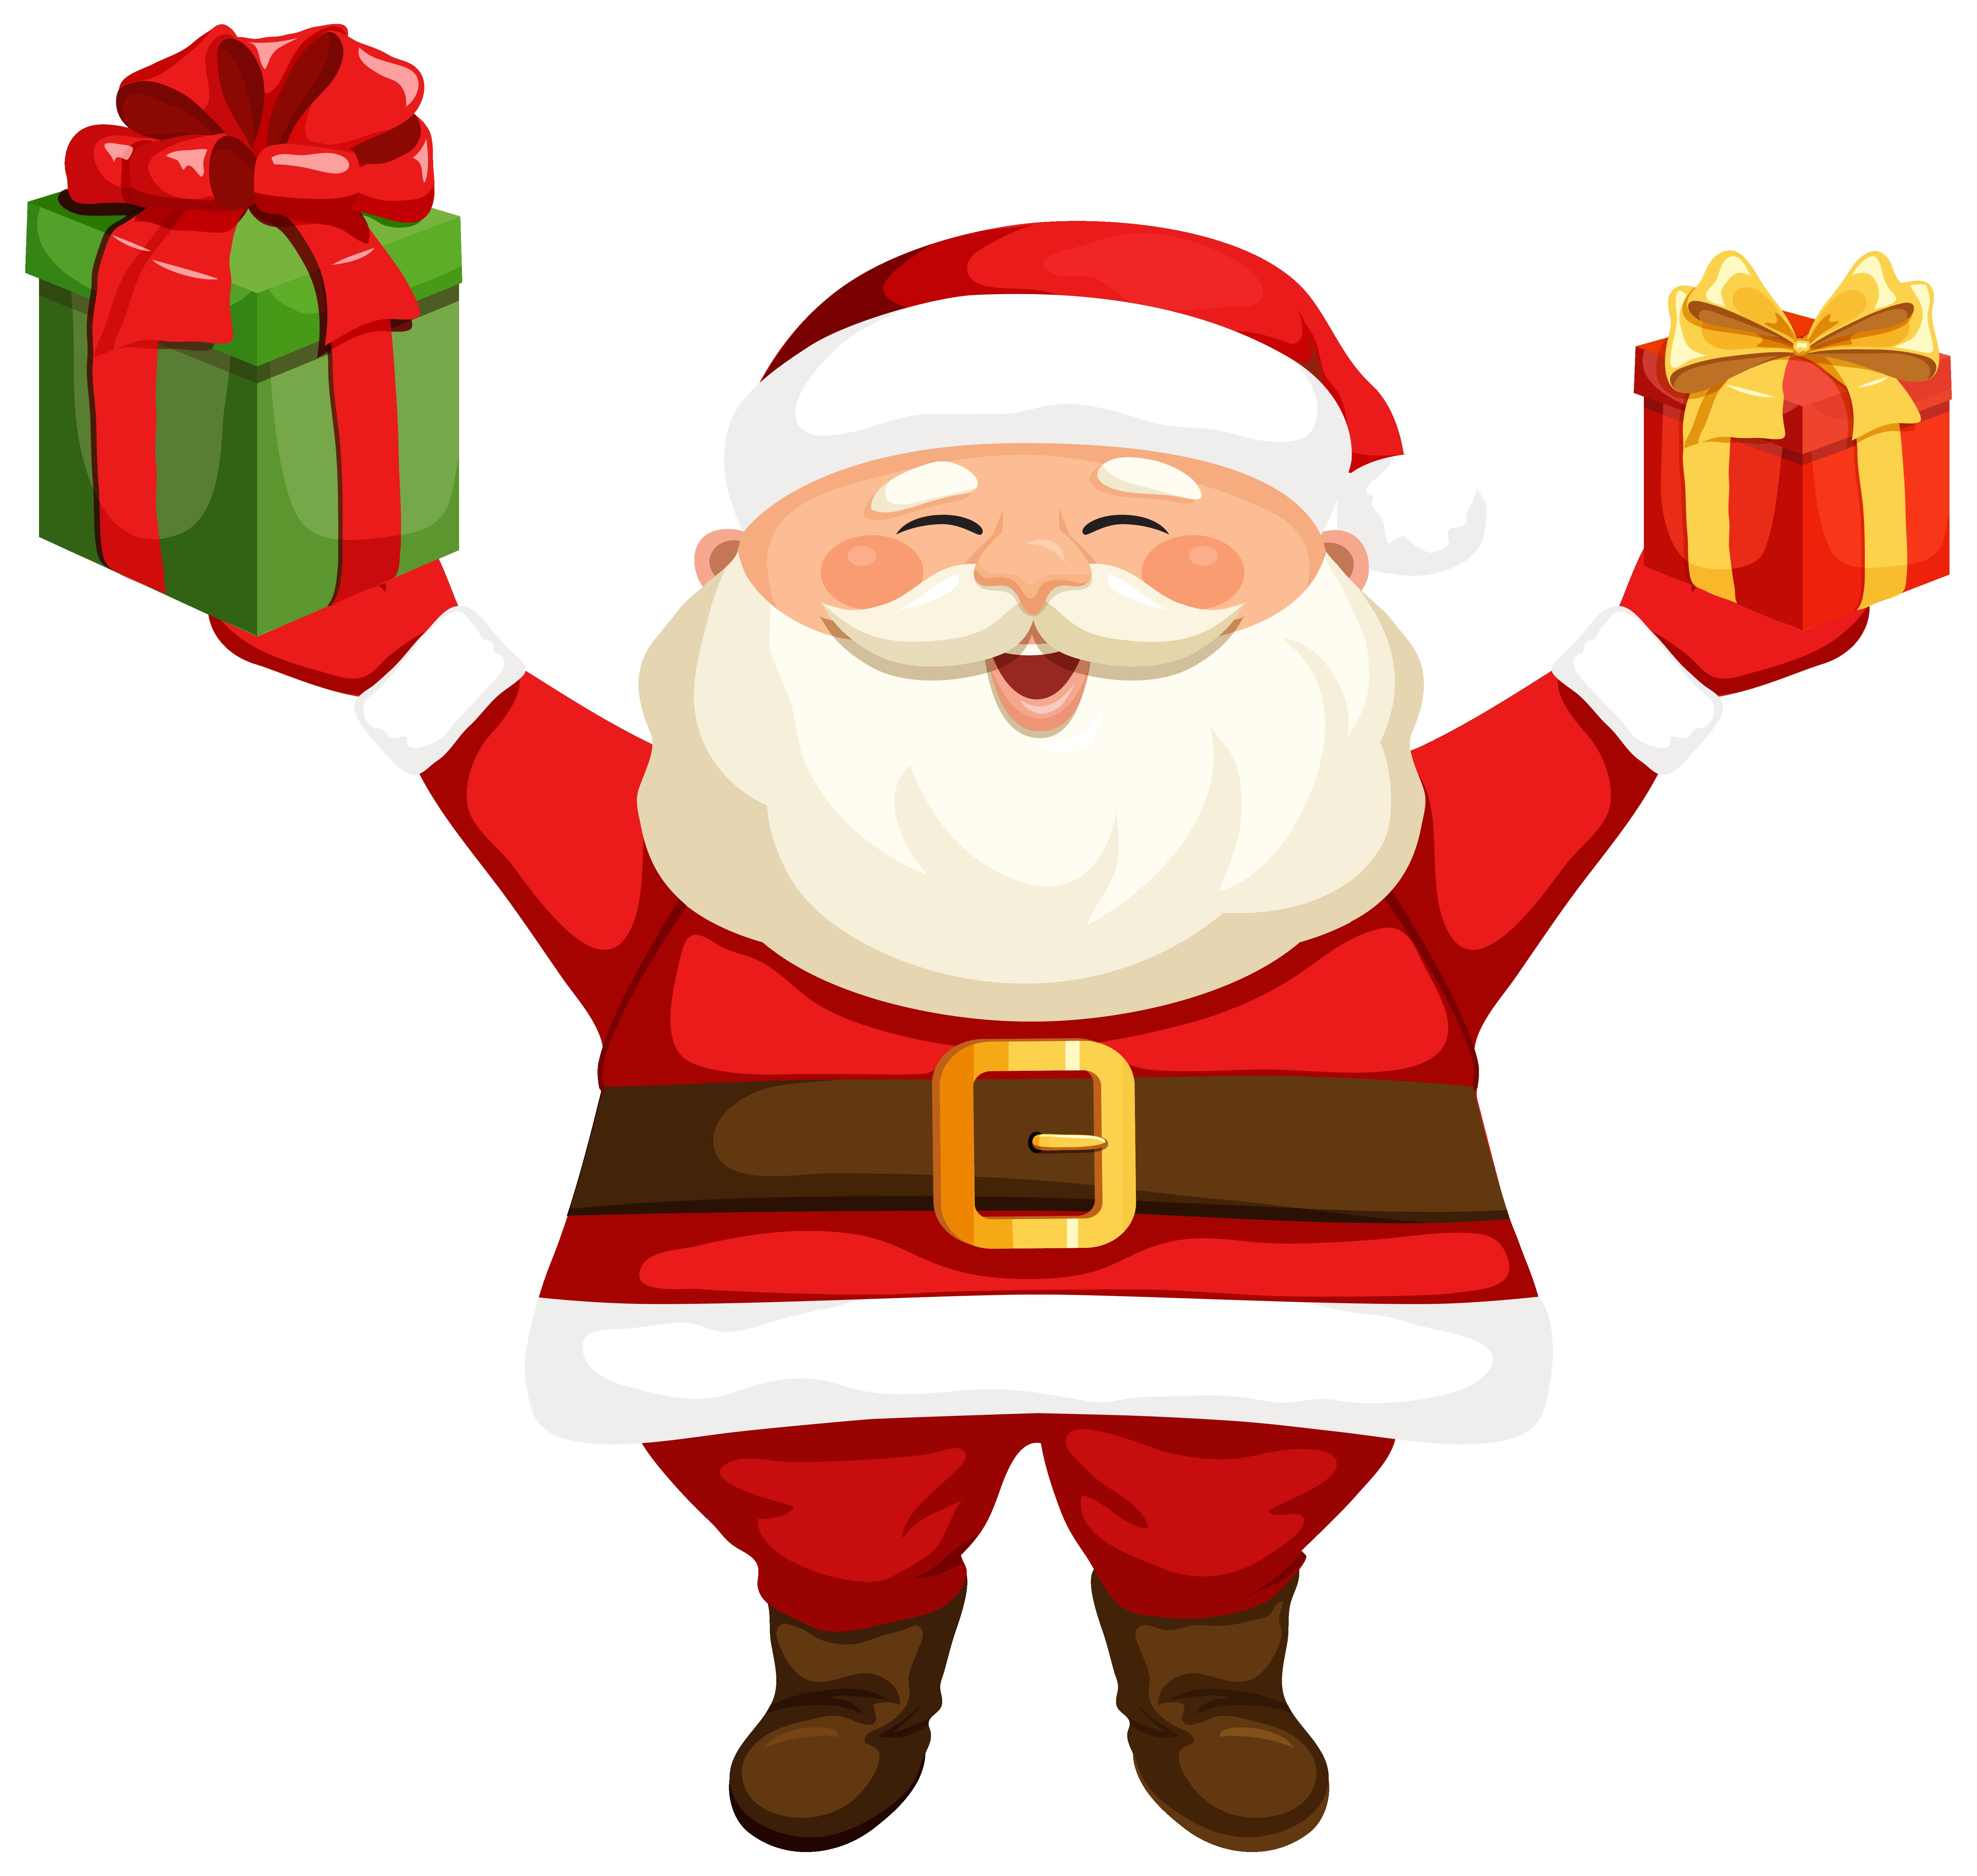 Santa clause clipart - Clipground